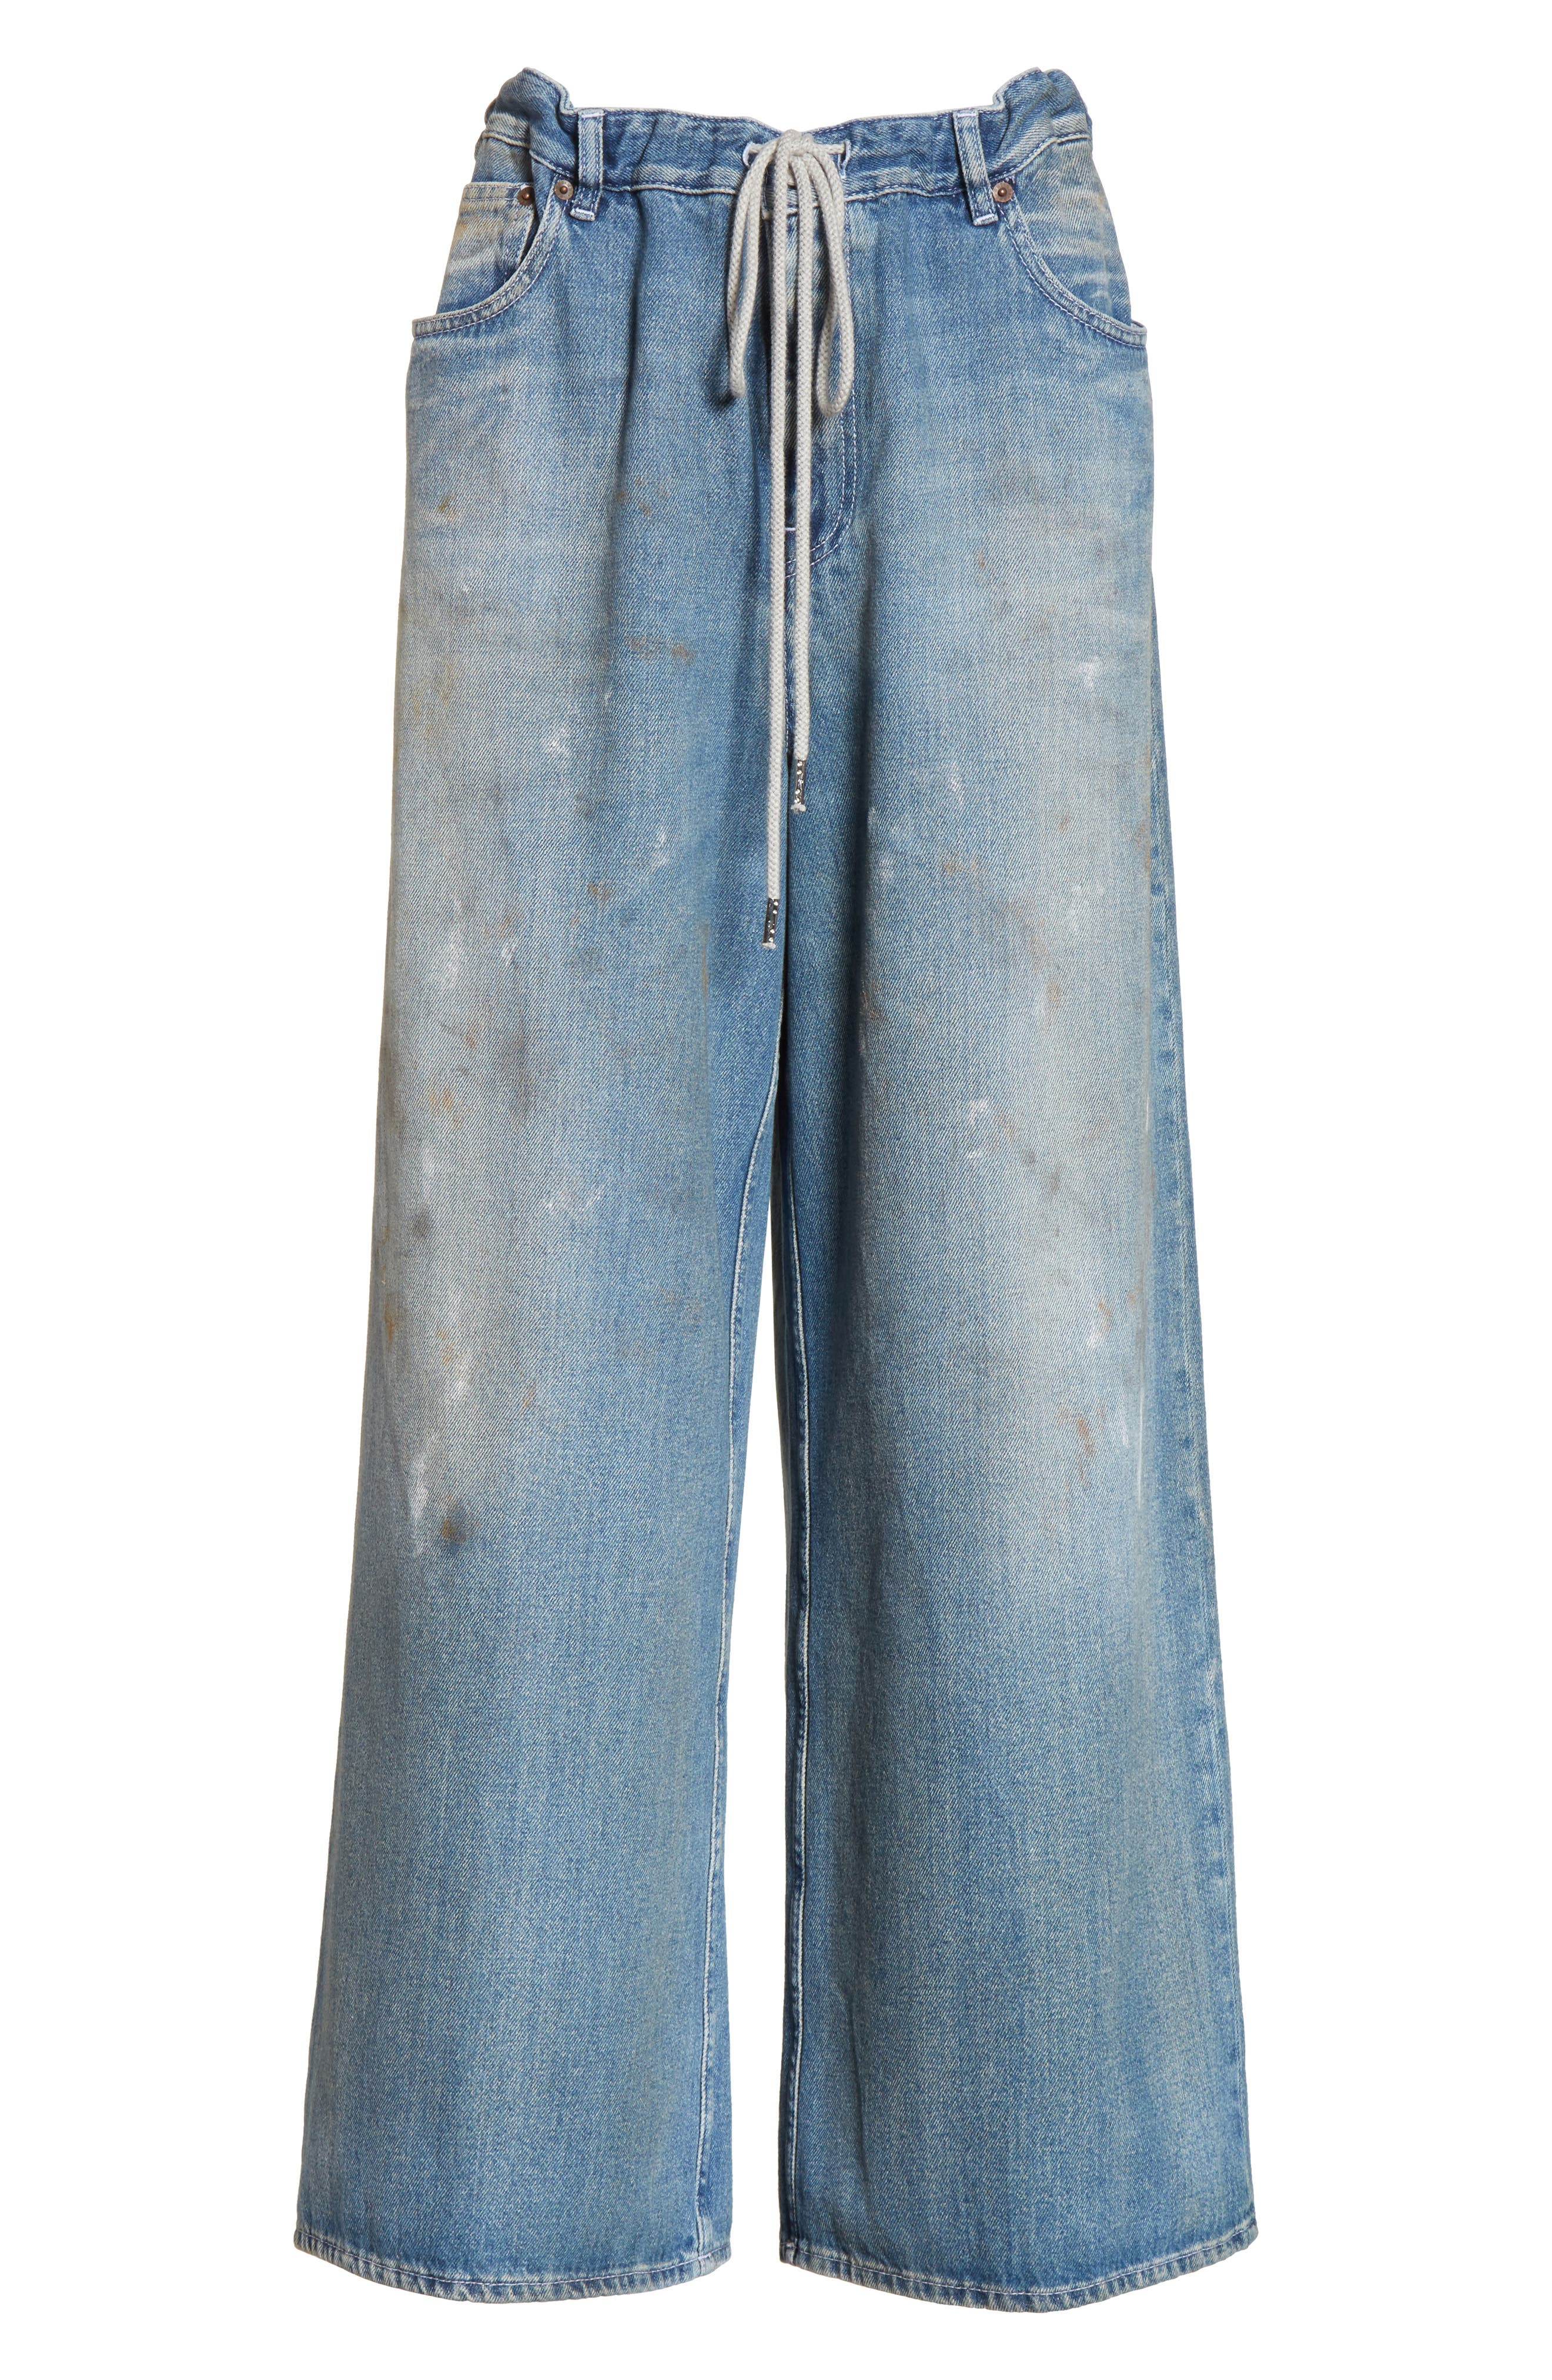 Drawstring Wide Leg Jeans,                             Alternate thumbnail 6, color,                             Indigo Stone Wash